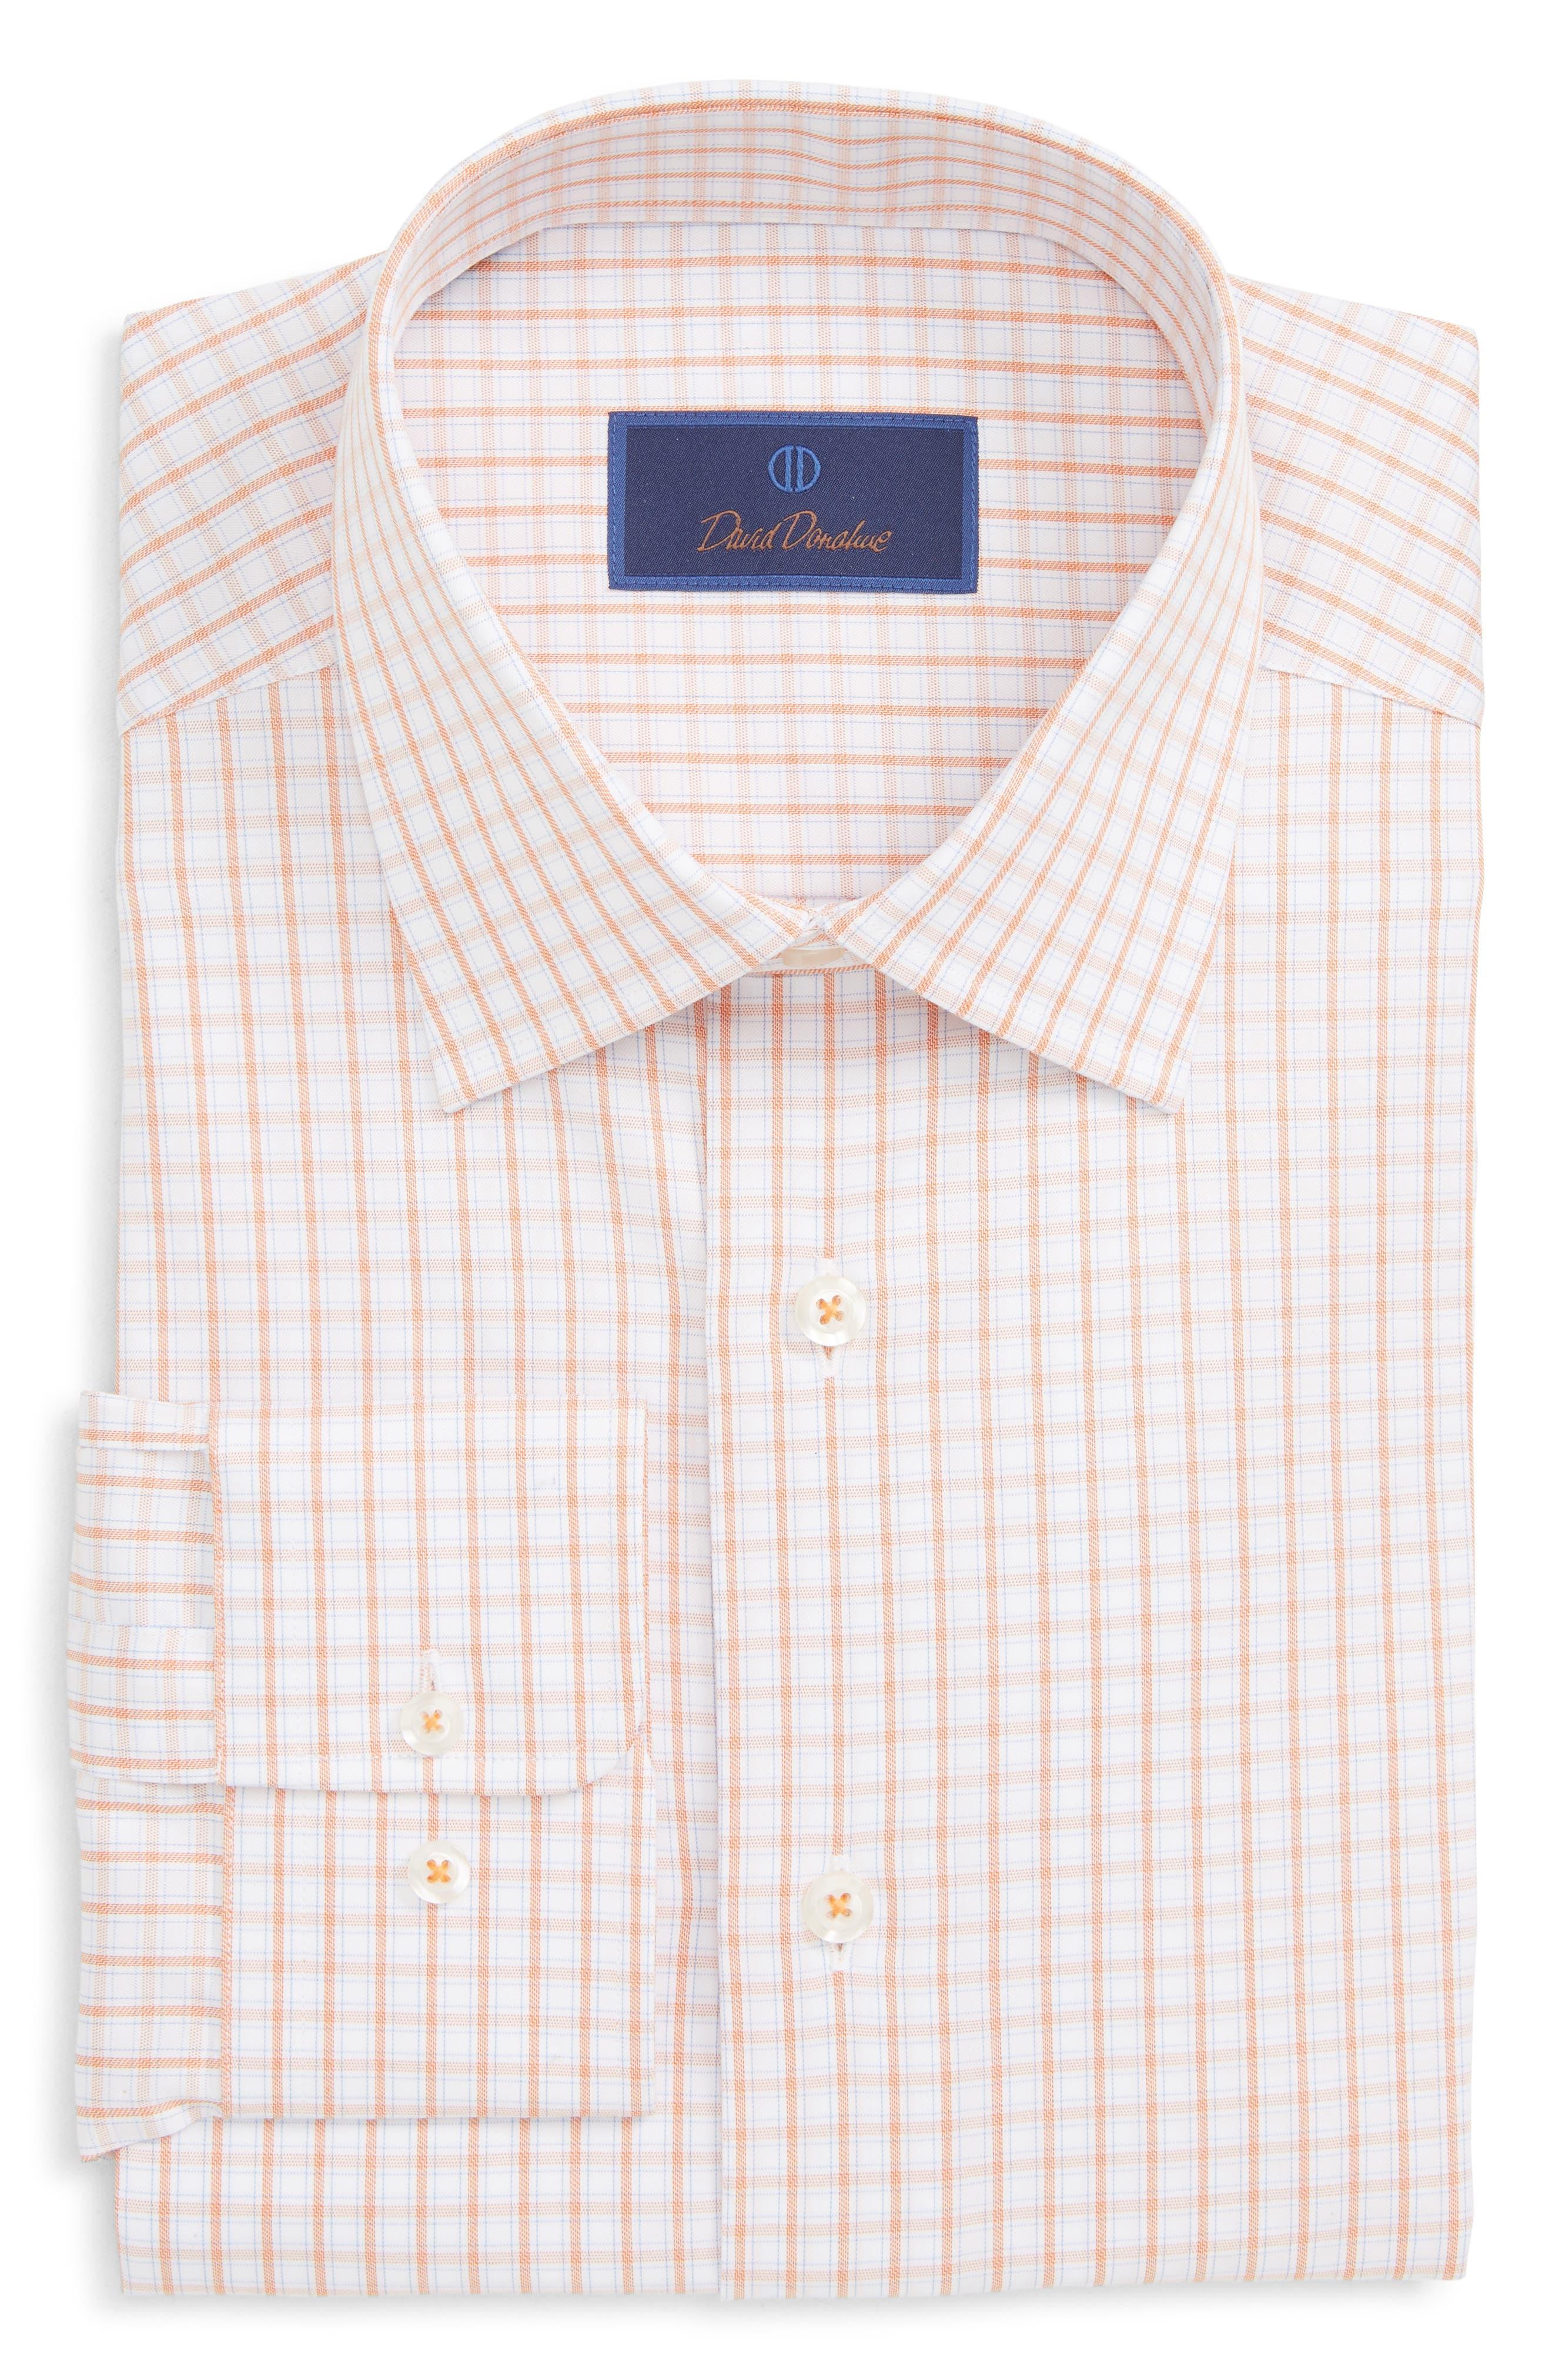 Regular Fit Plaid Dress Shirt, Main, color, MELON